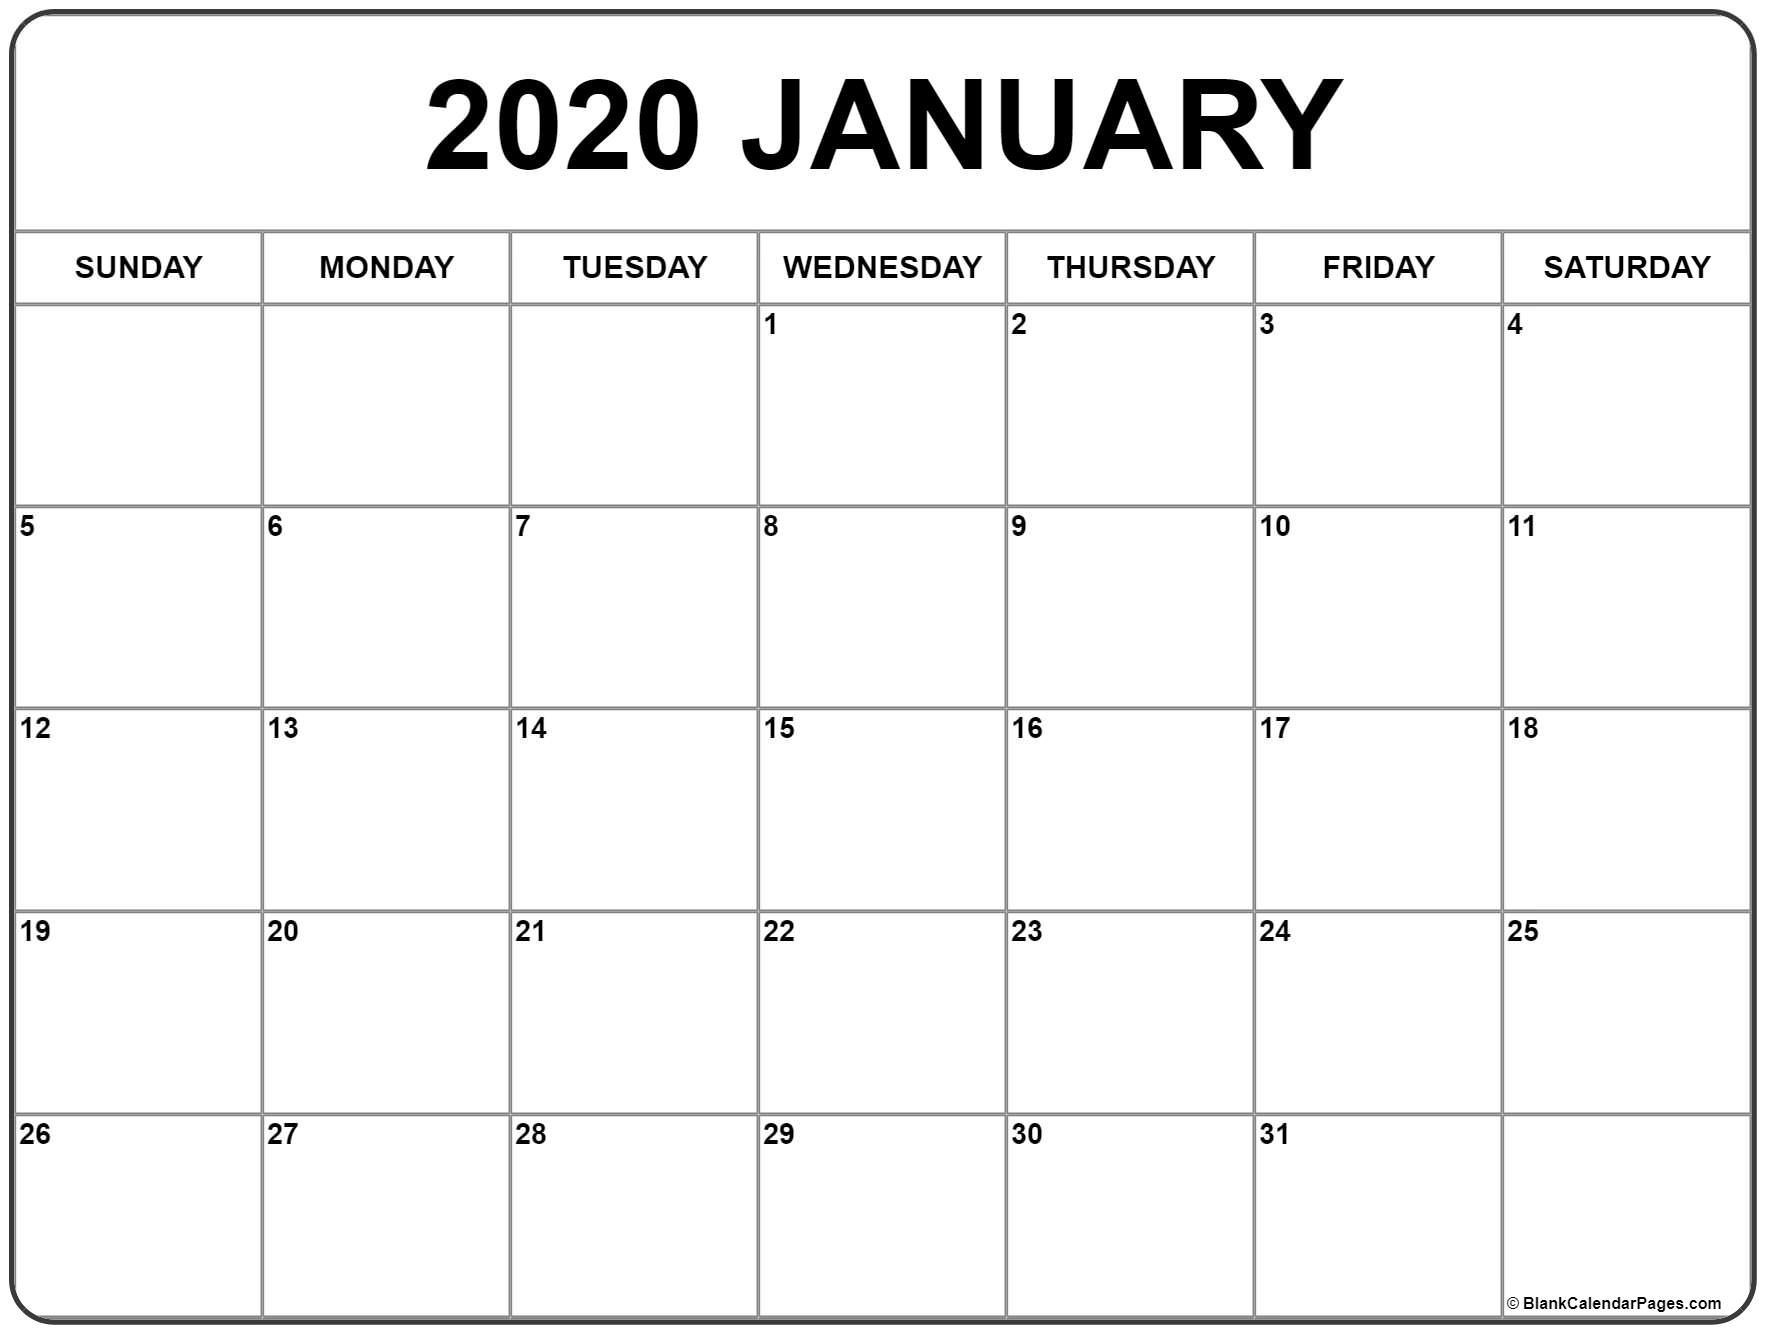 January 2020 Calendar | Free Printable Monthly Calendars-Image Of January 2020 Calendar